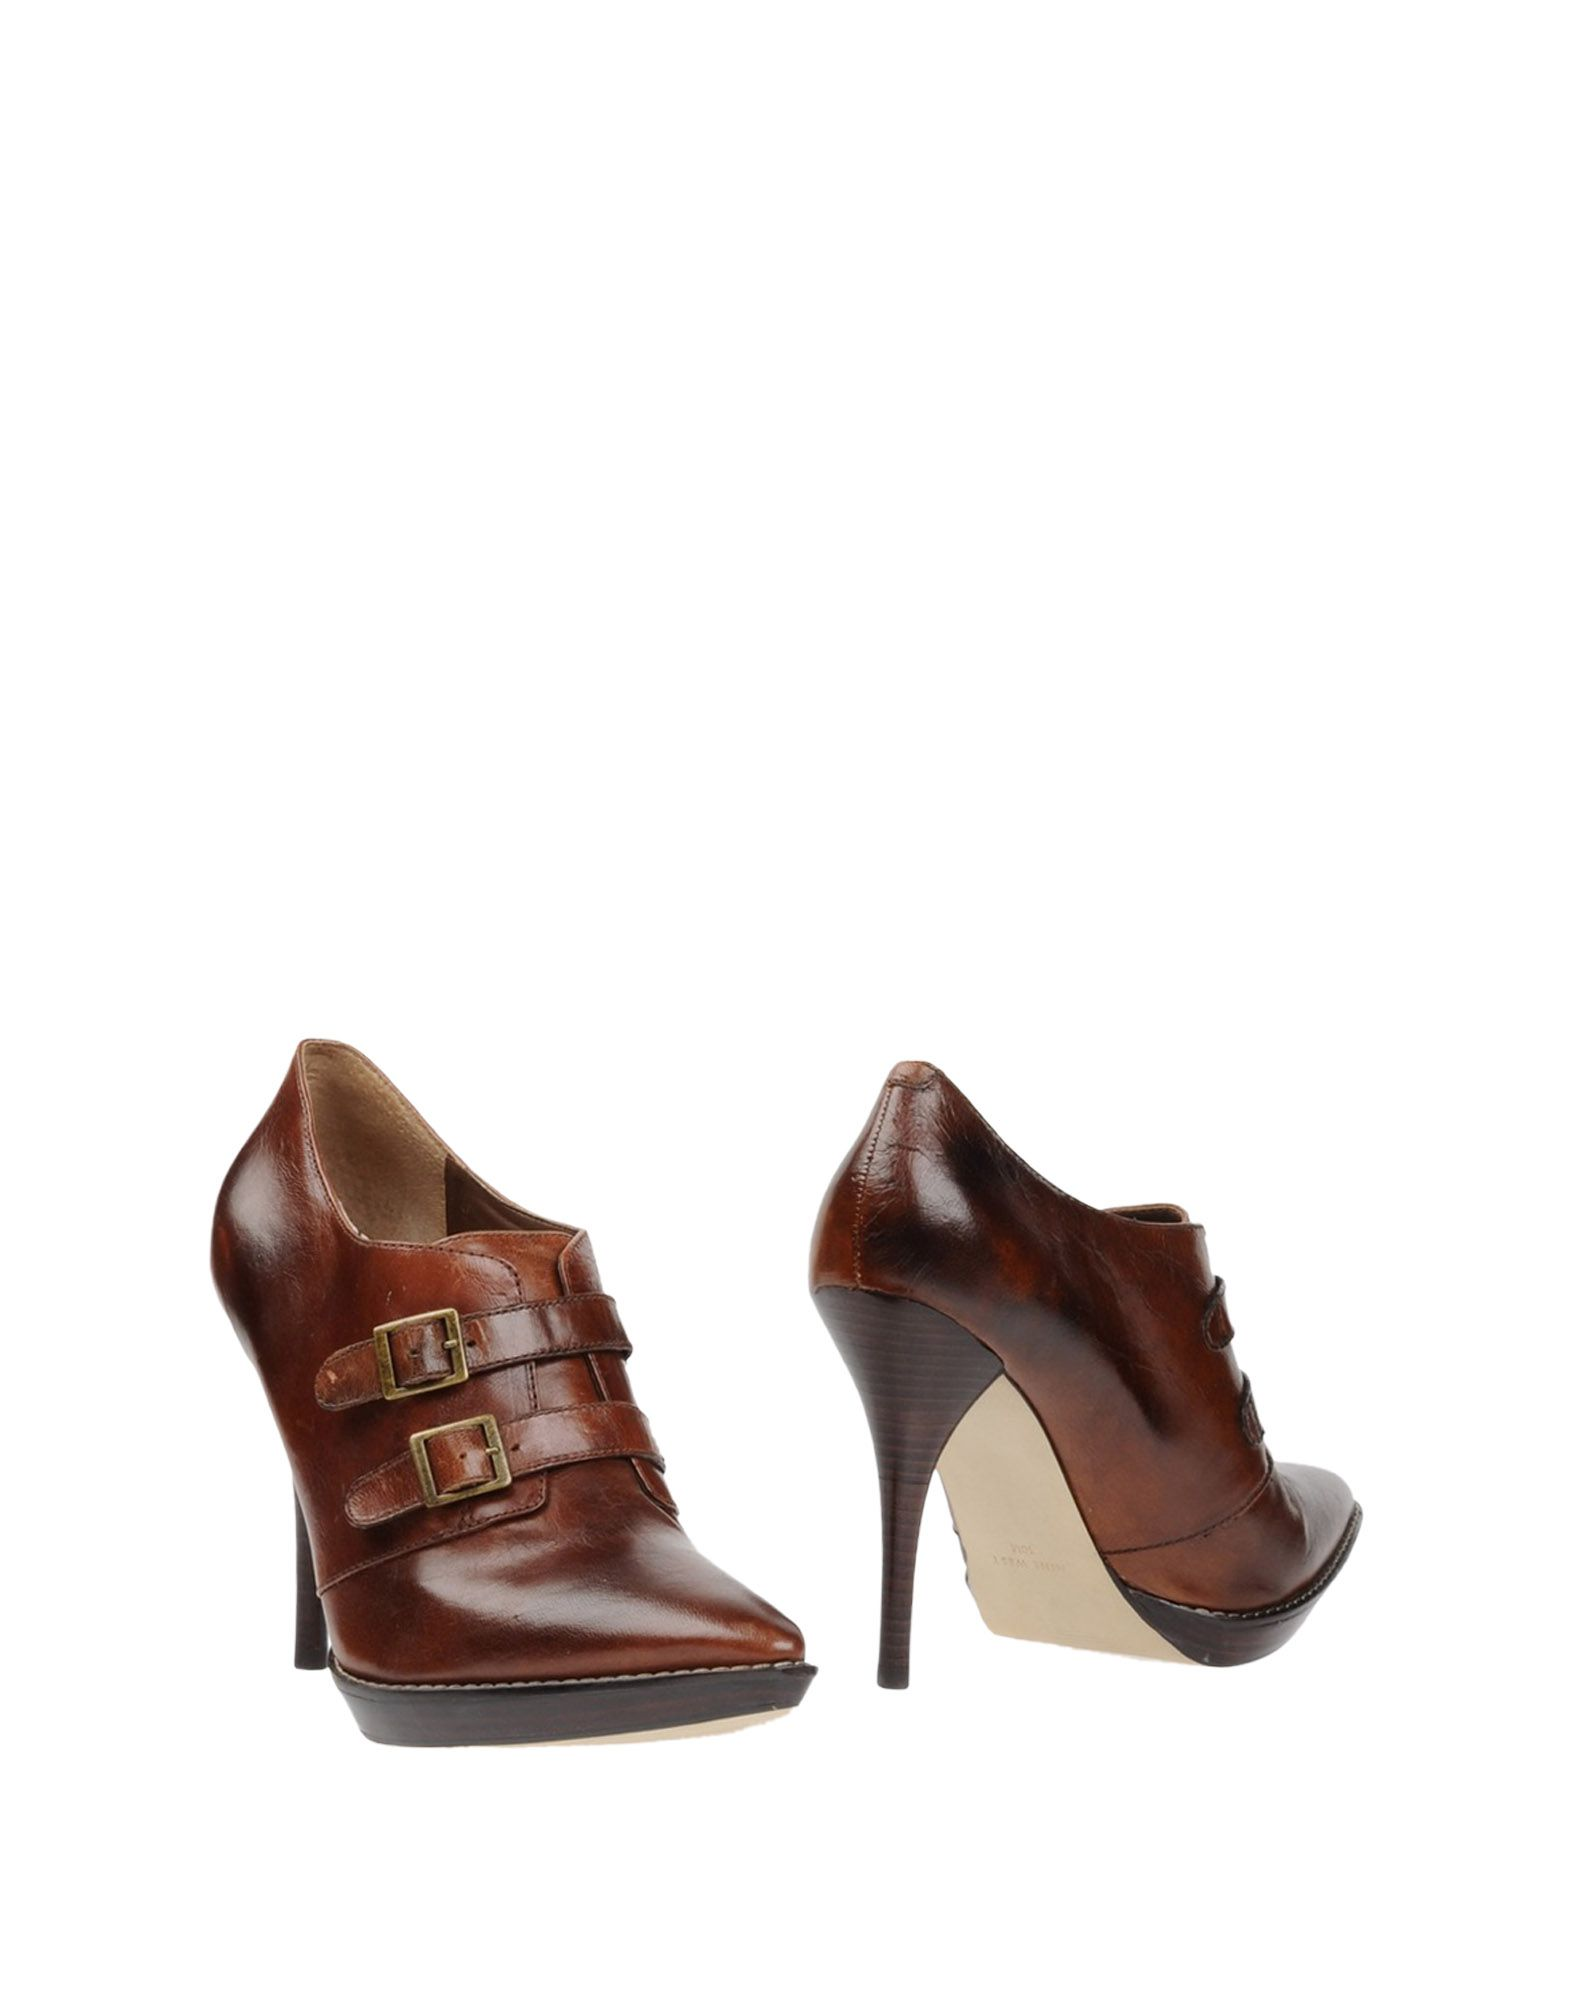 Nine West Shoe Stores In Nj